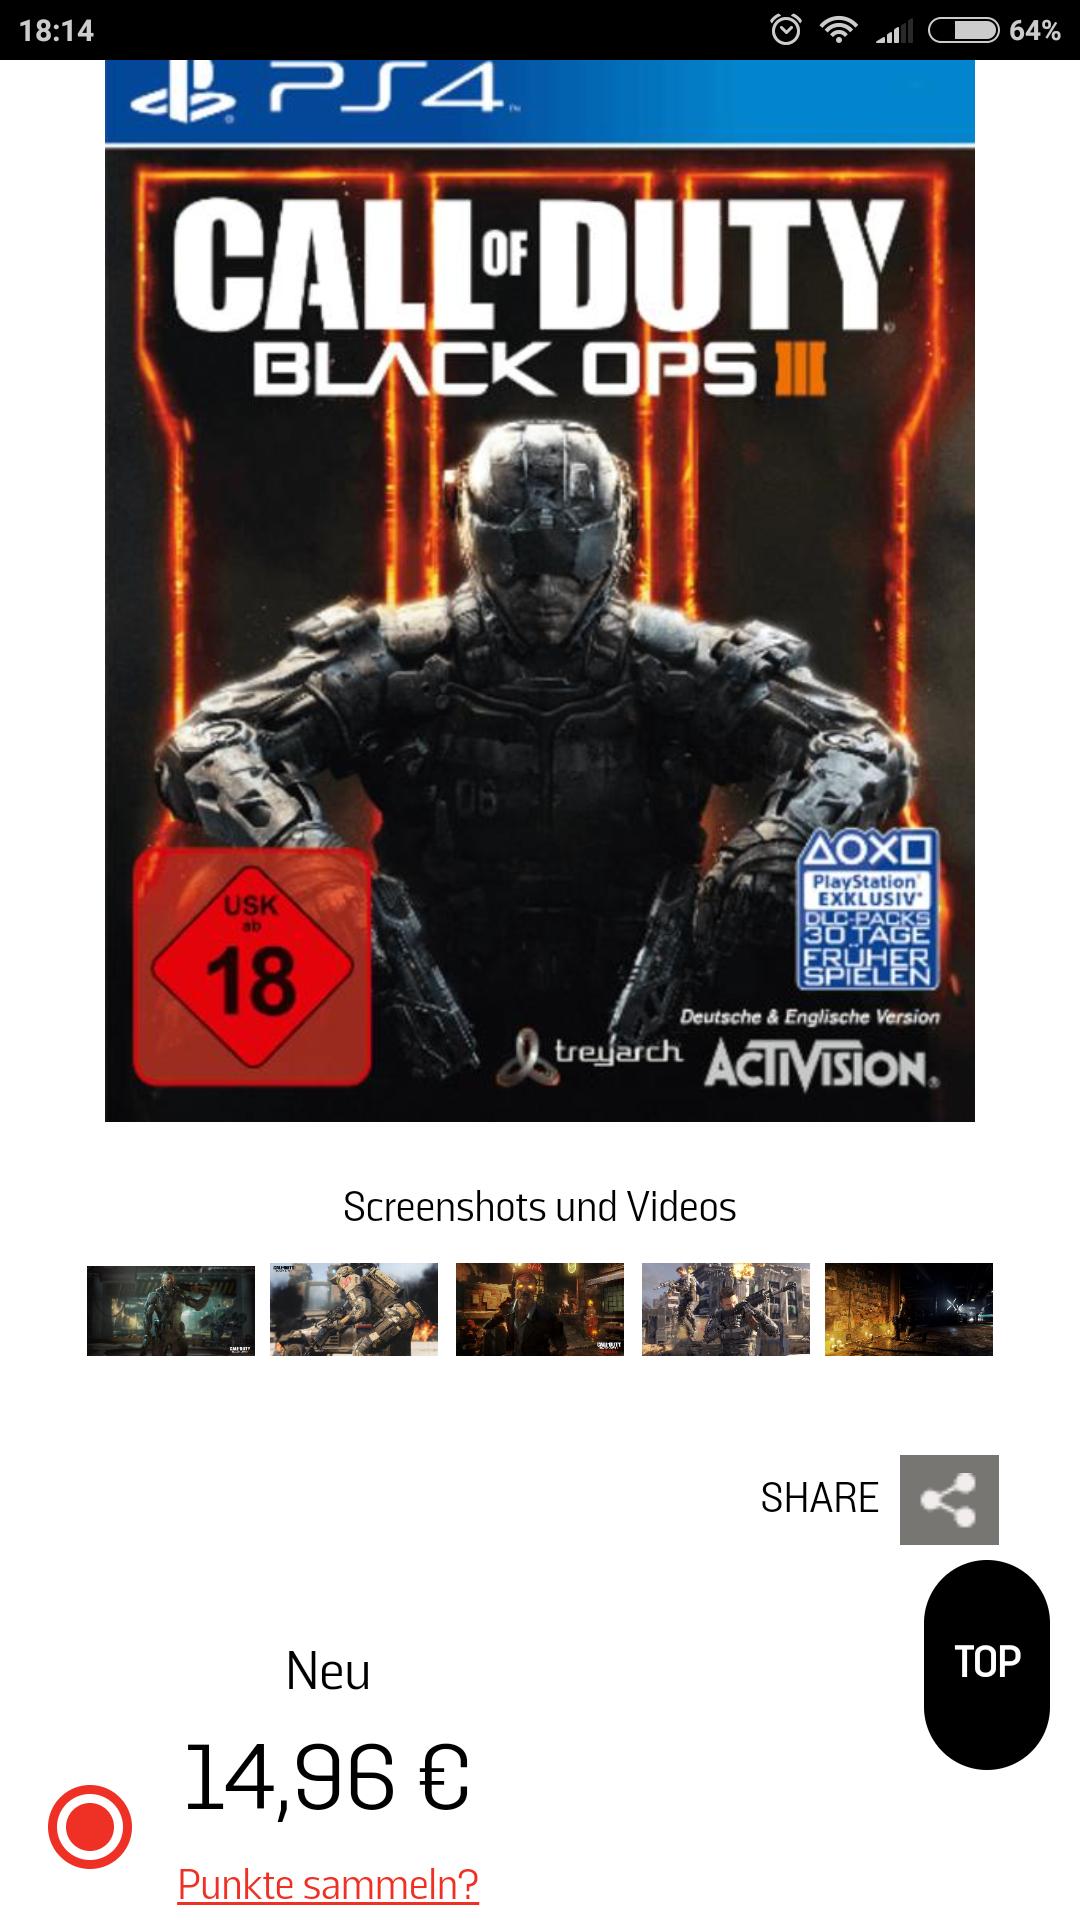 (Gamestop) Call of Duty Black Ops 3 PS4 für 14,96€ bei Marktabholung